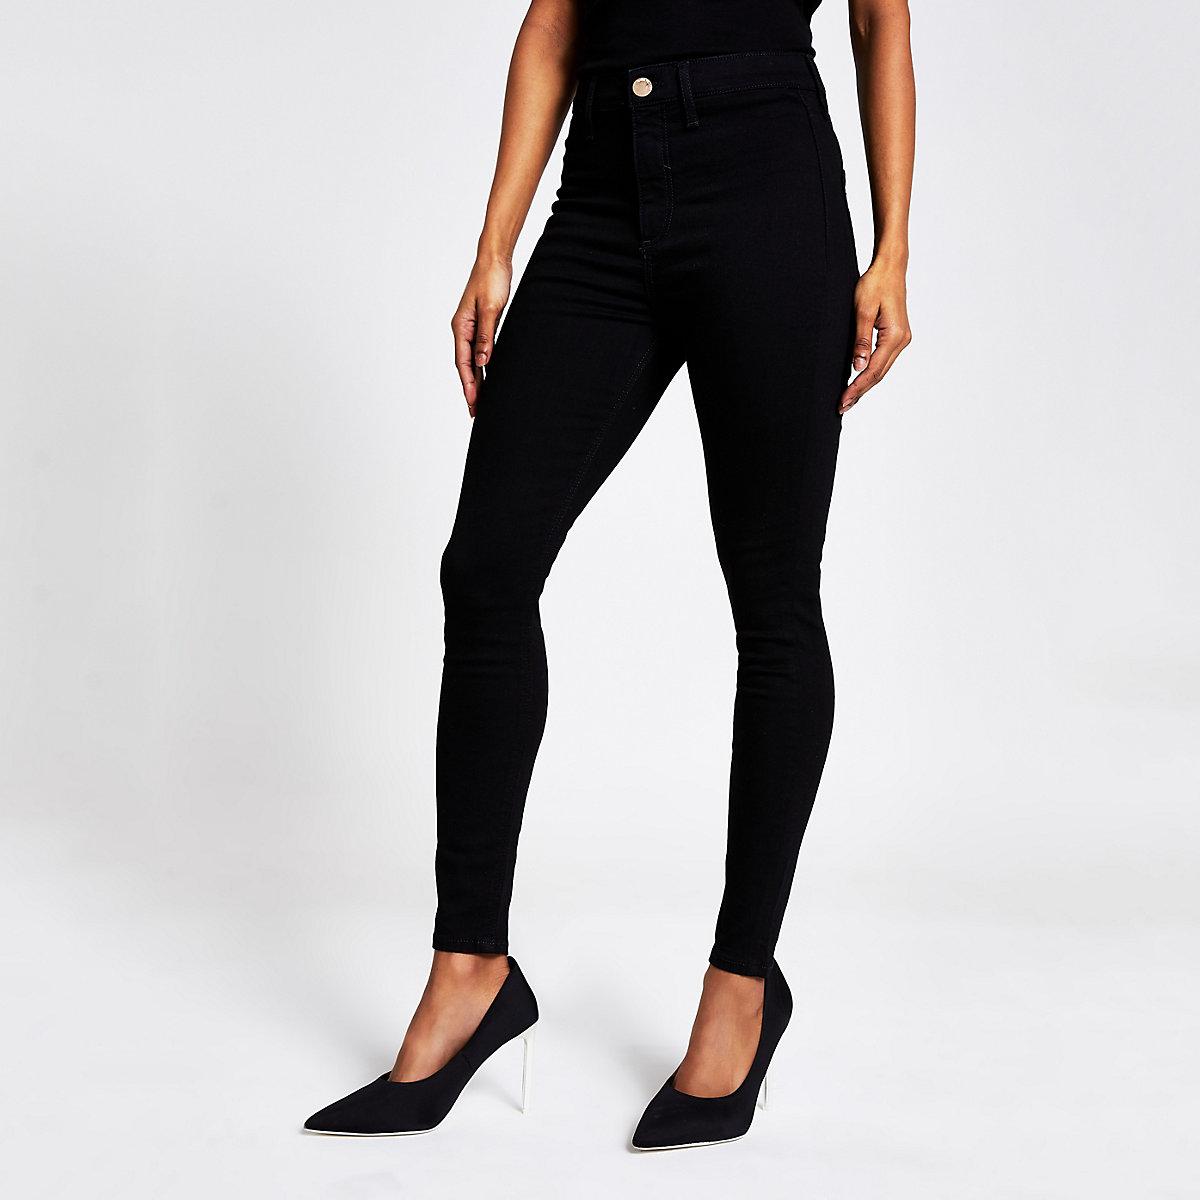 Petite black Kaia high waist disco jeans